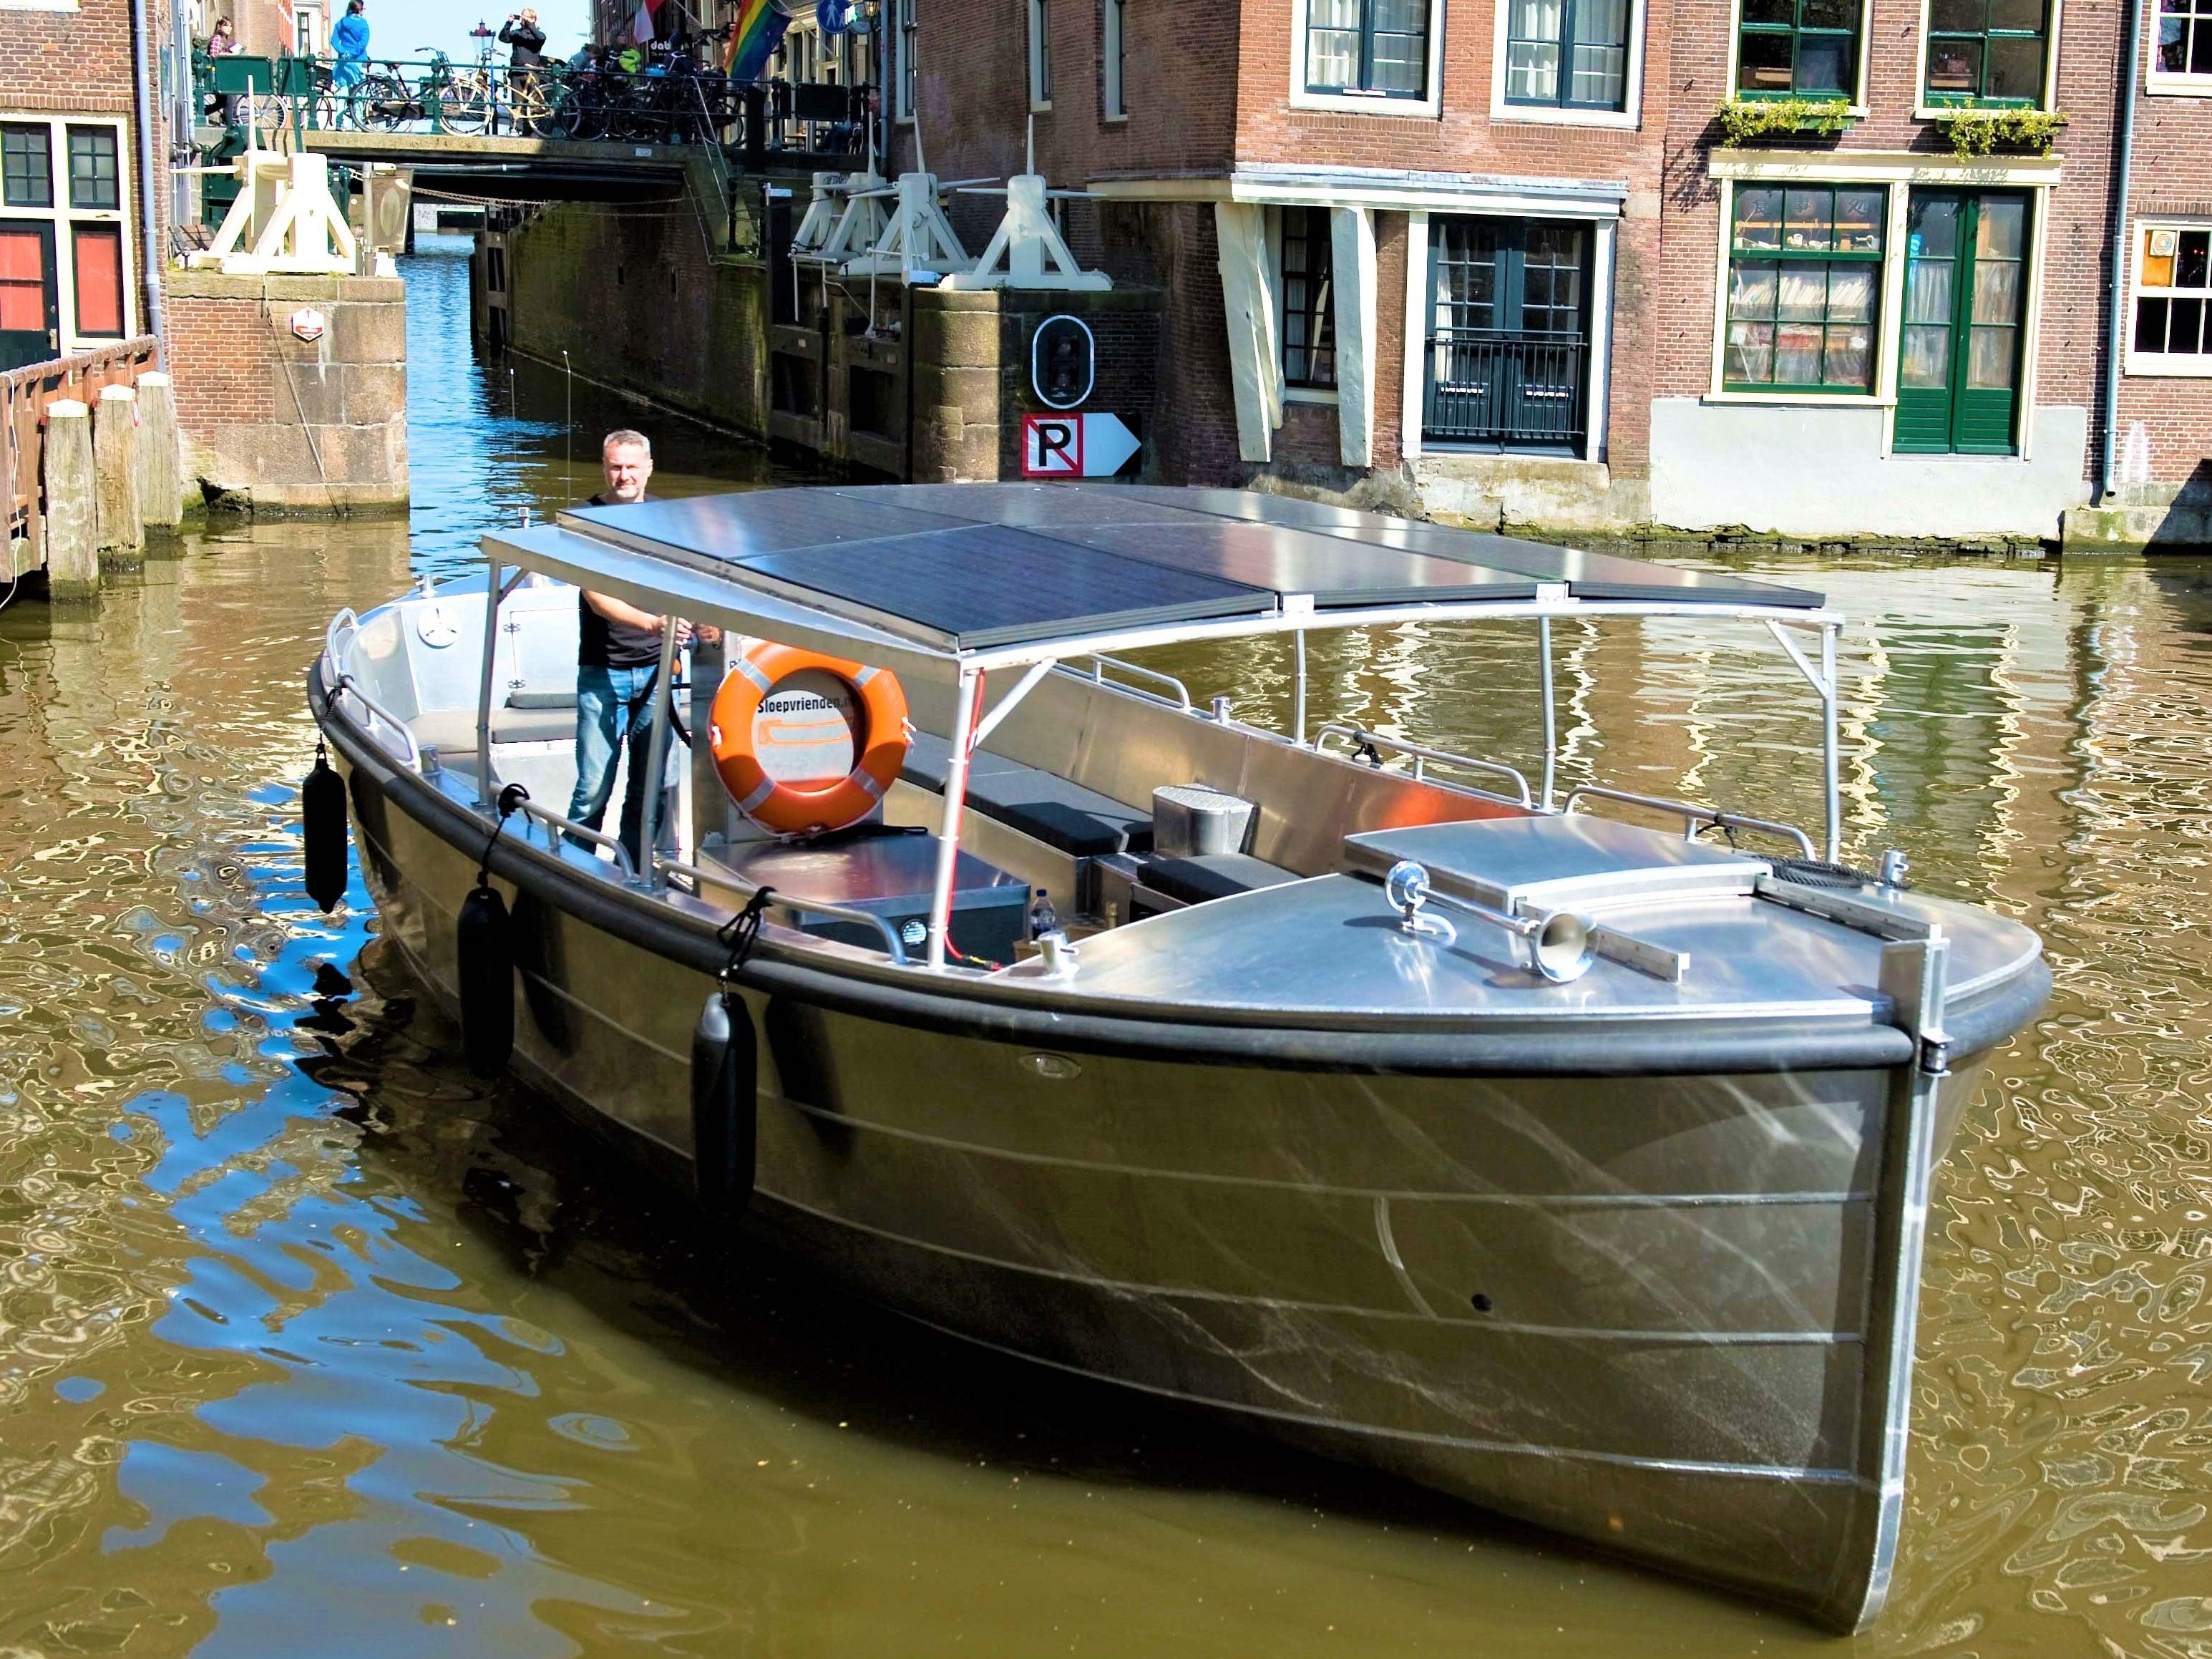 Voordeligste Sloepverhuur Amsterdam Sloepvrienden